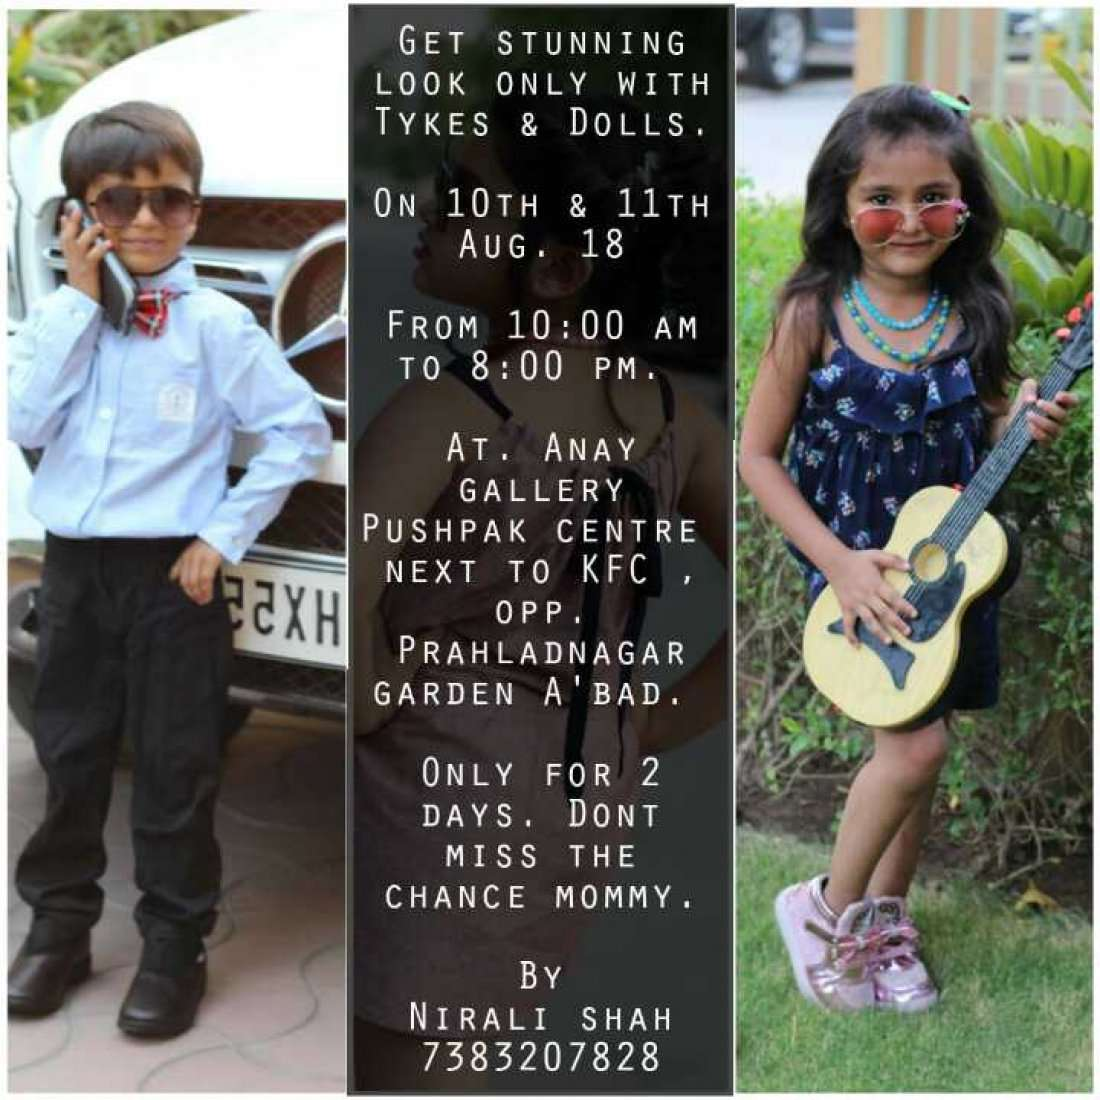 Rakhi bonanza by tykes & dolls the most trendy and comfortable kids wear